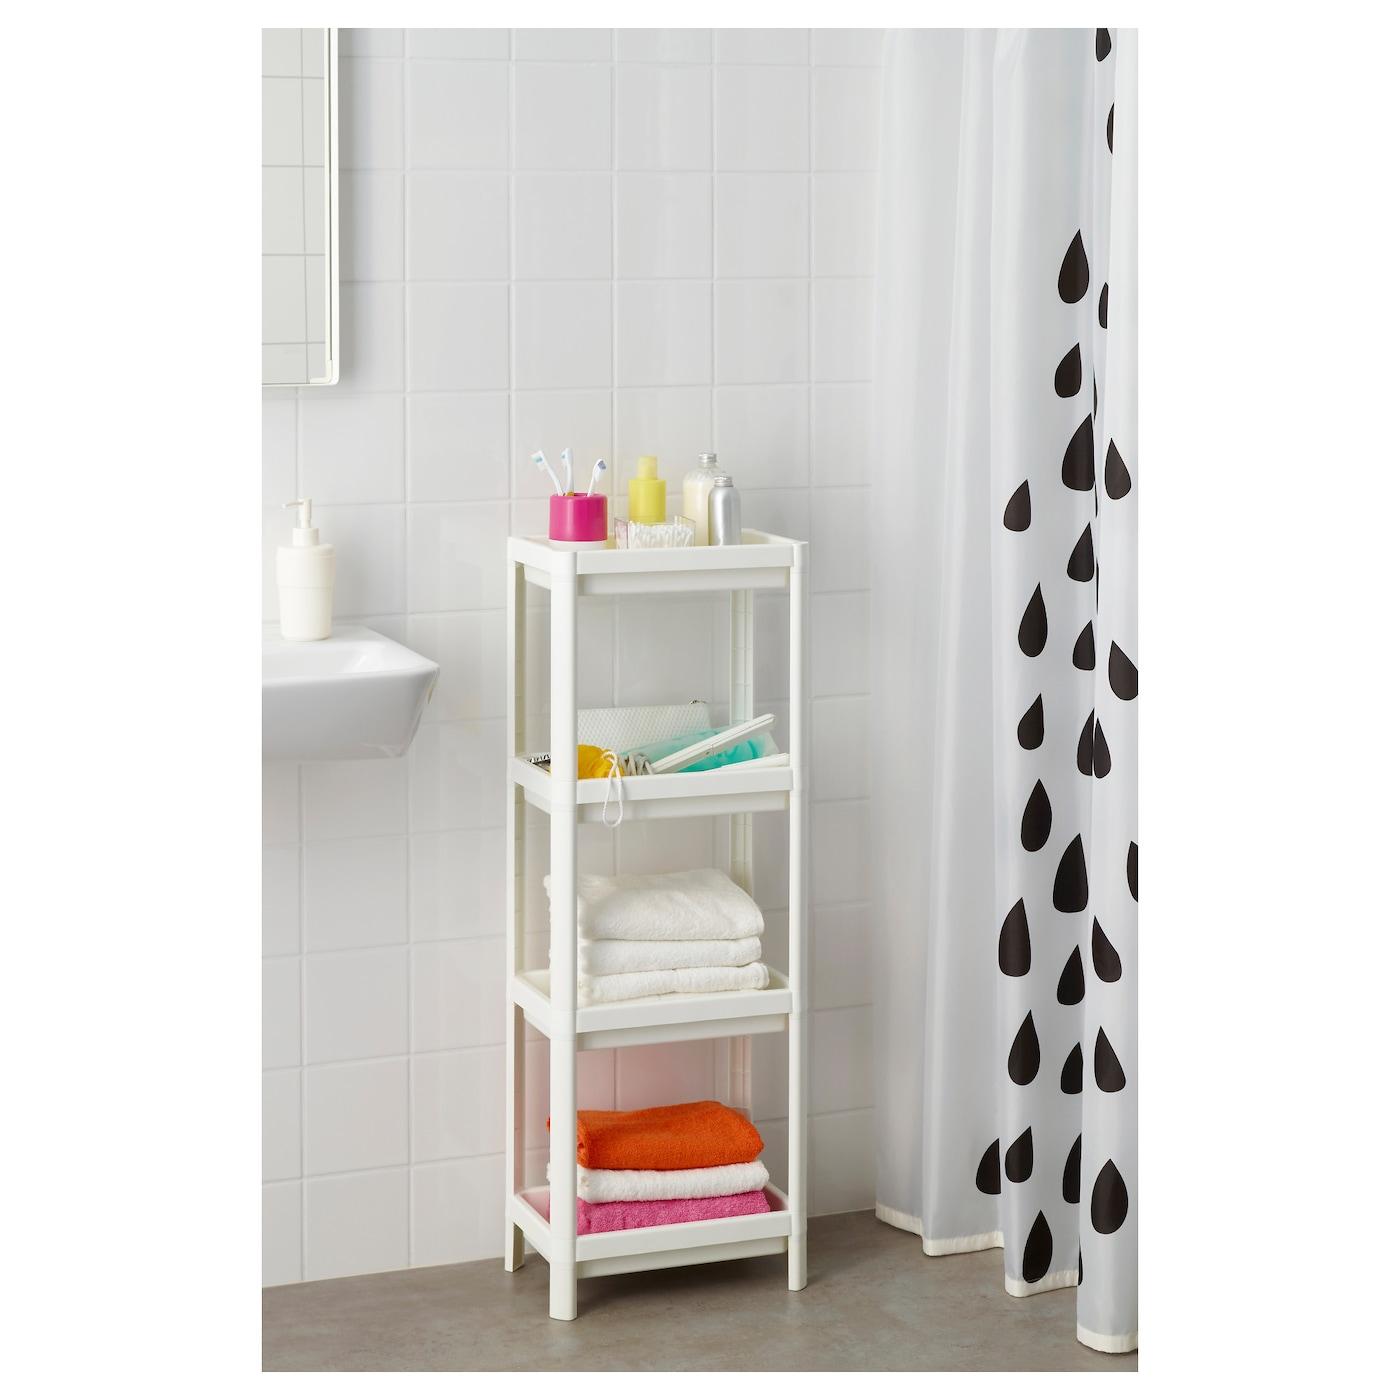 Shelf for bathroom - Ikea Vesken Shelf Unit Perfect In A Small Bathroom